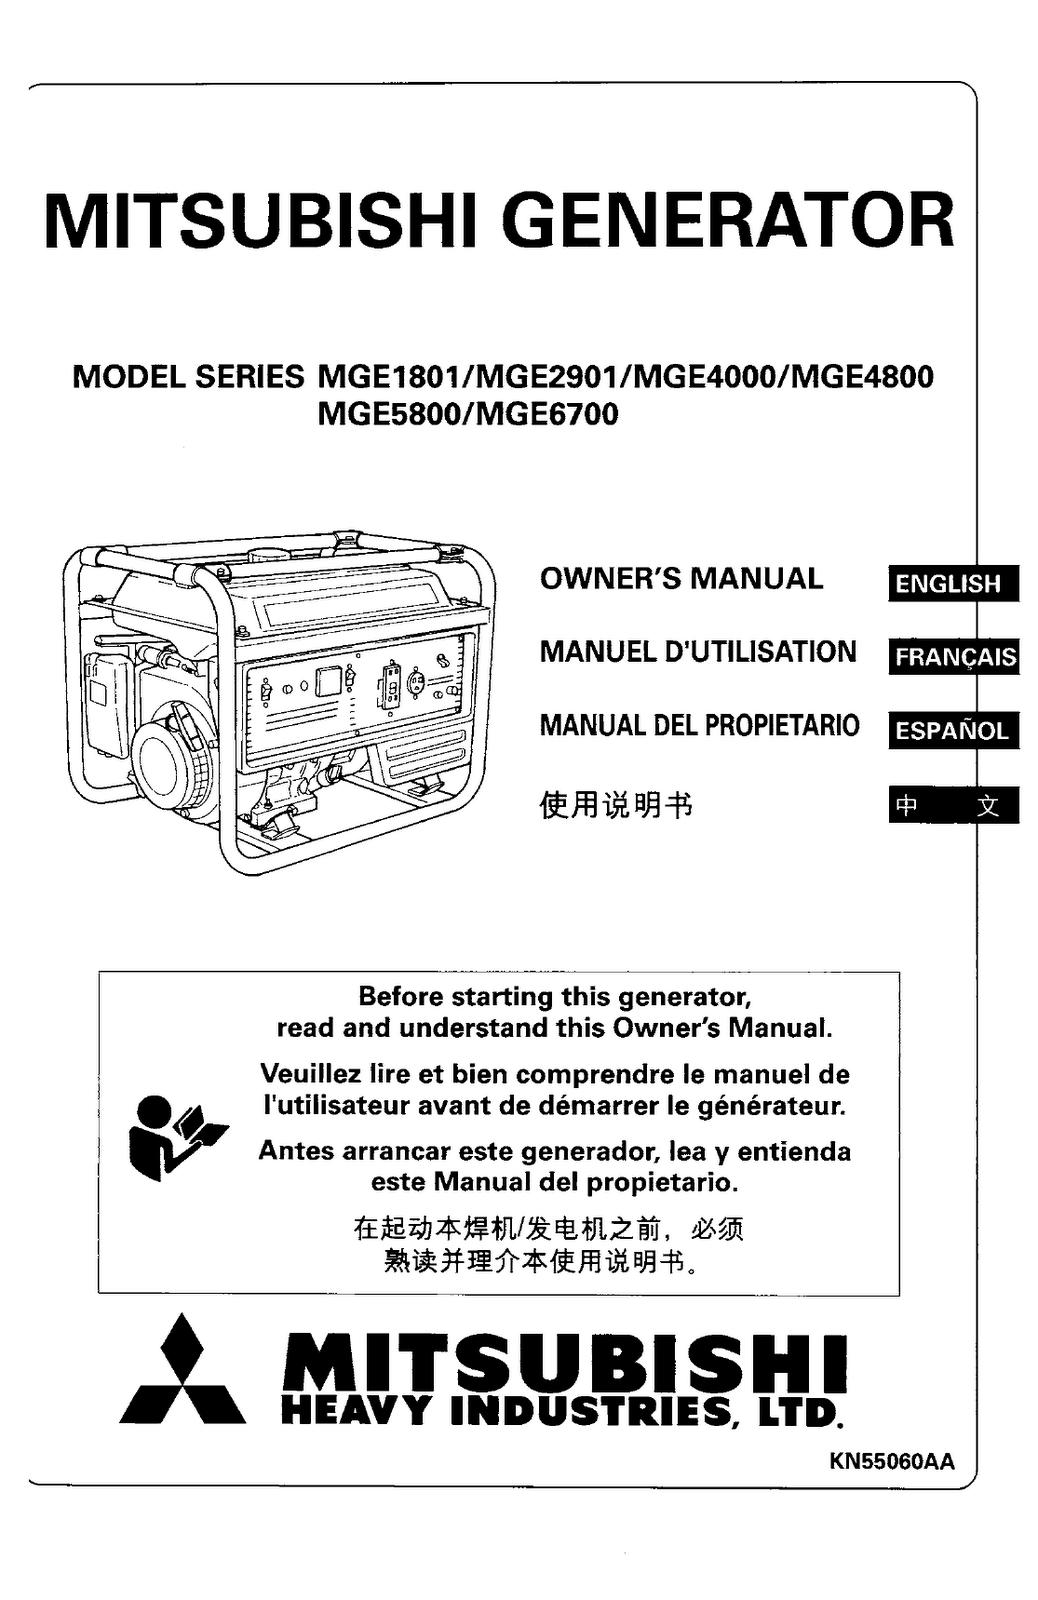 mitsubishi manuals free mitsubishi generator owners manual pdf